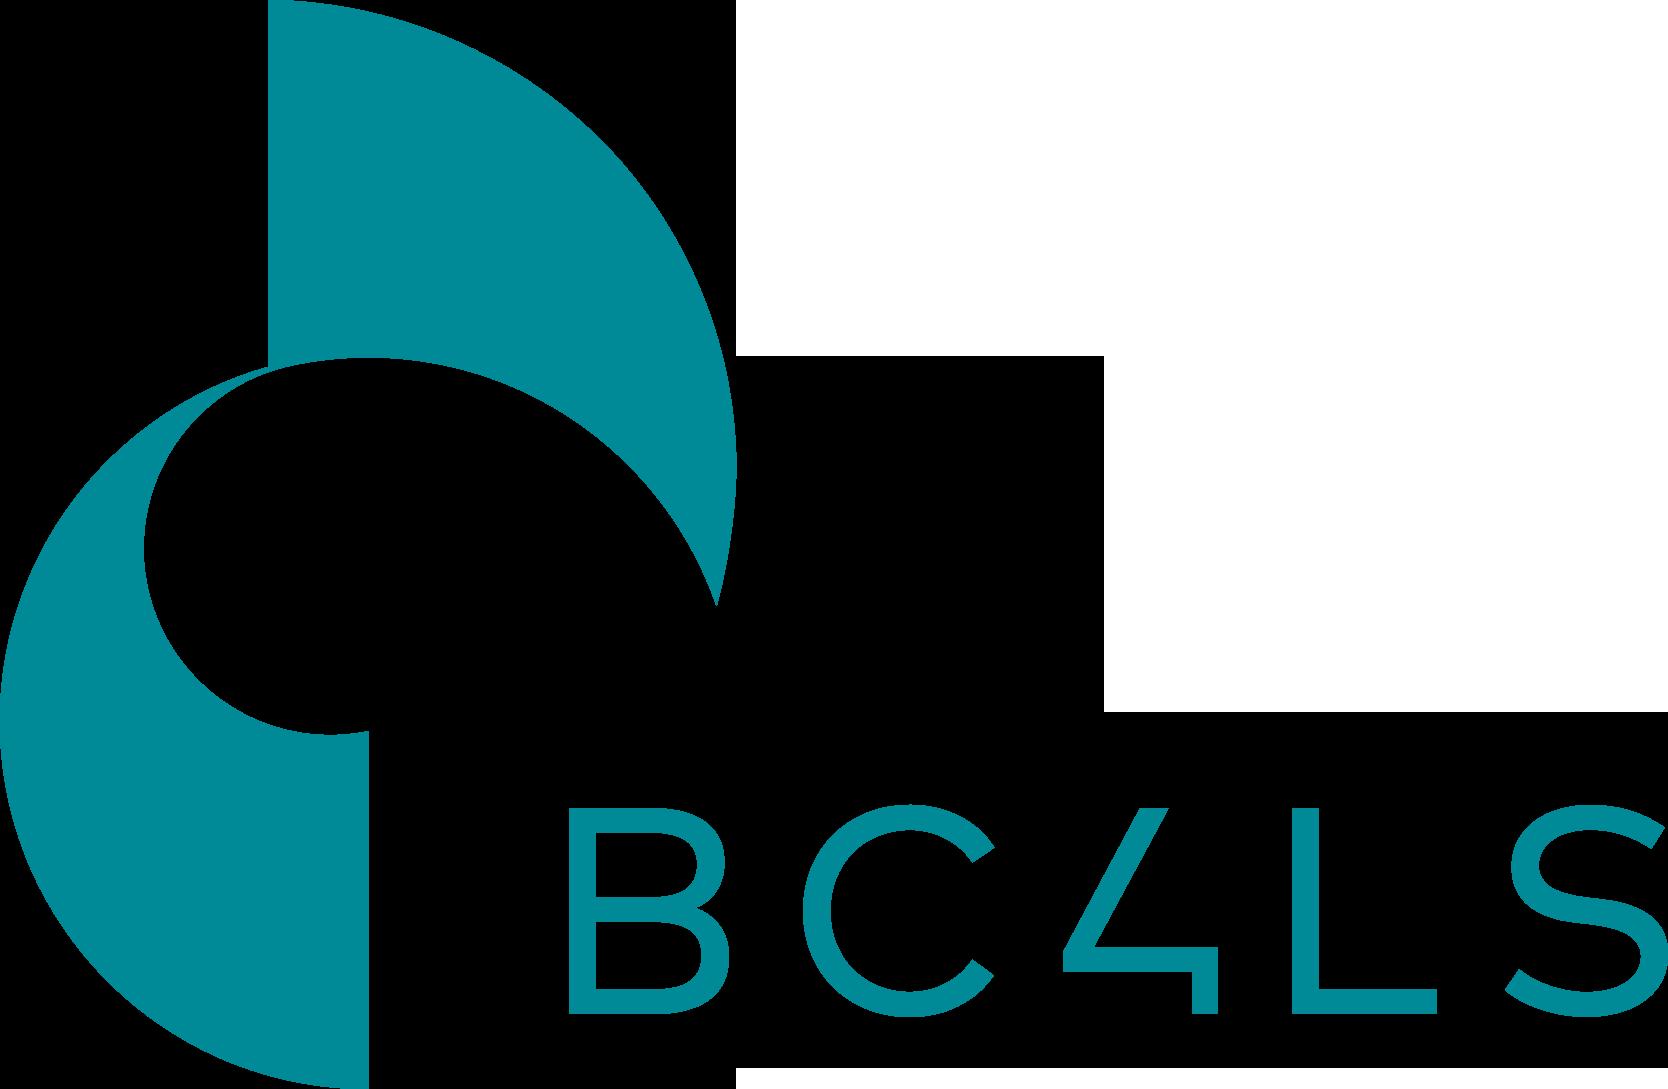 BC4LS